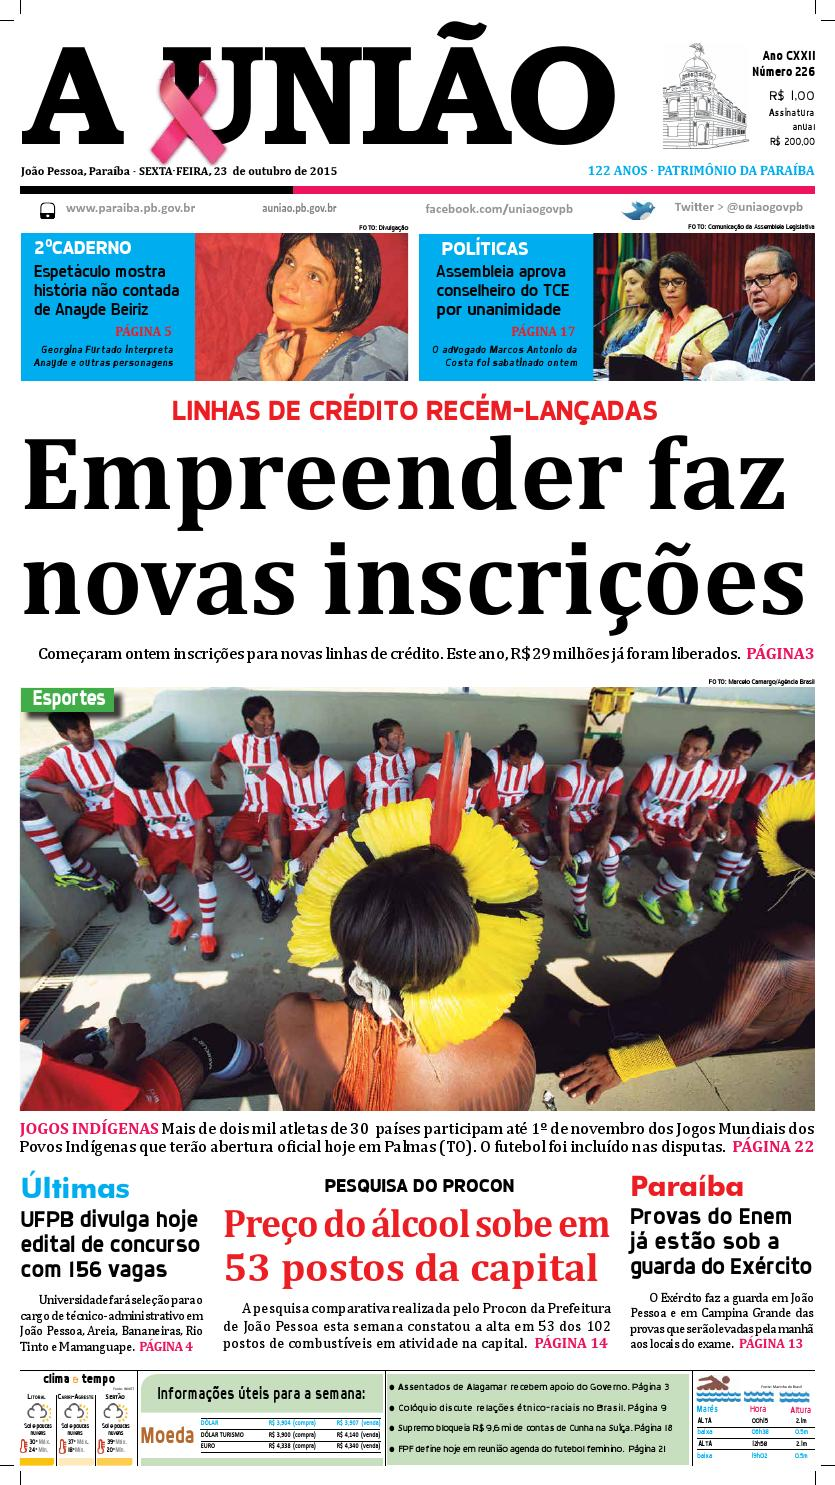 b1ff0fce6c8 Jornal A União - 23 10 2015 by Jornal A União - issuu